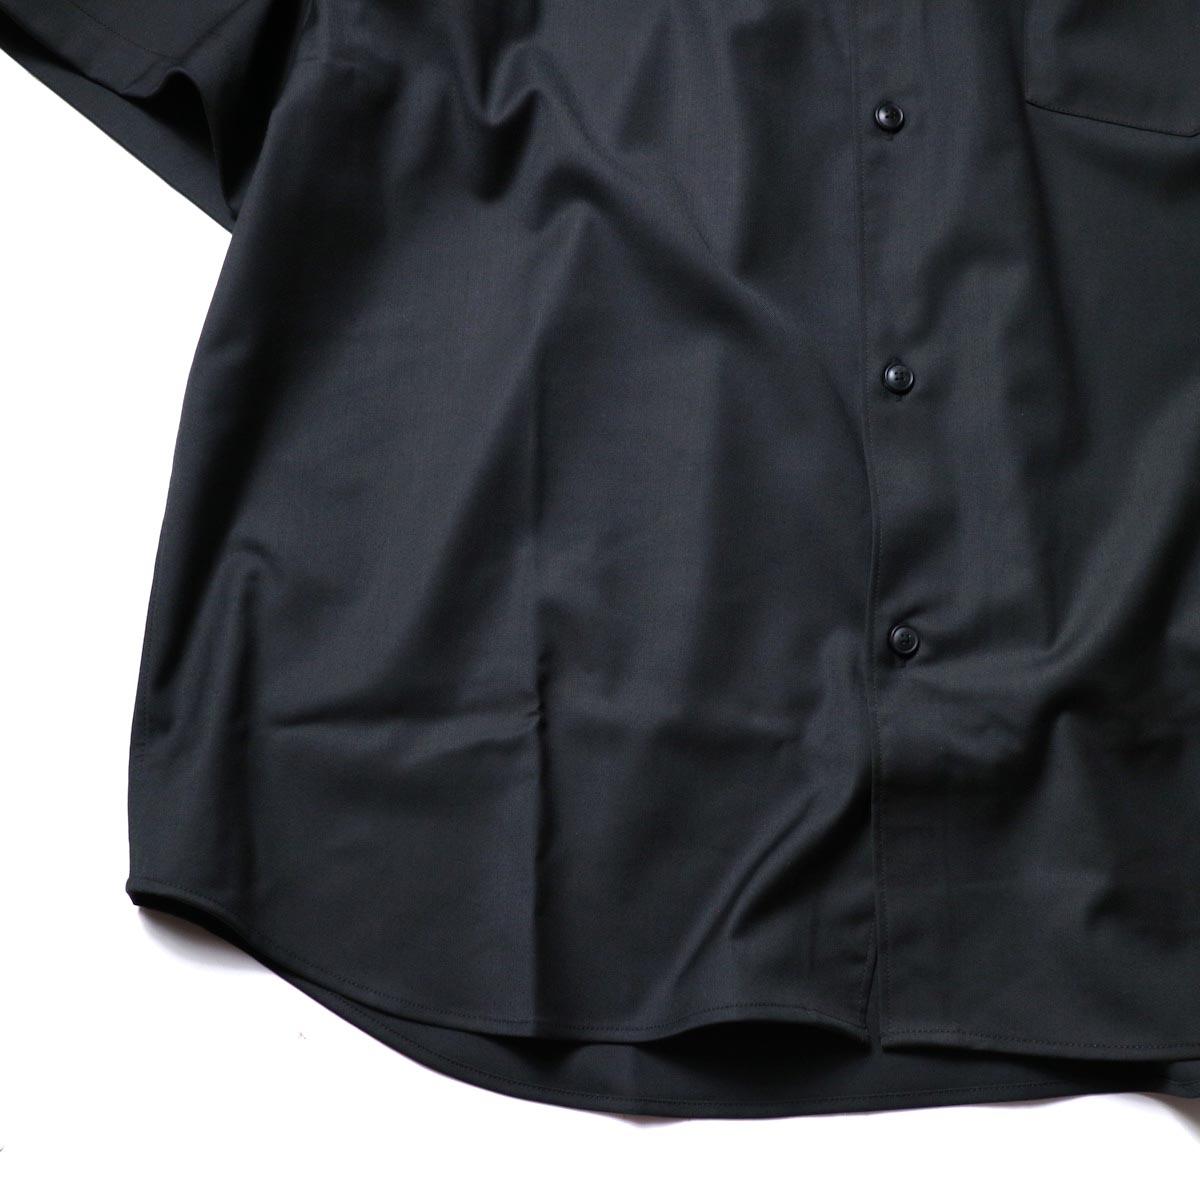 alvana / Wrinkle Proof Shirts (Black)袖、裾